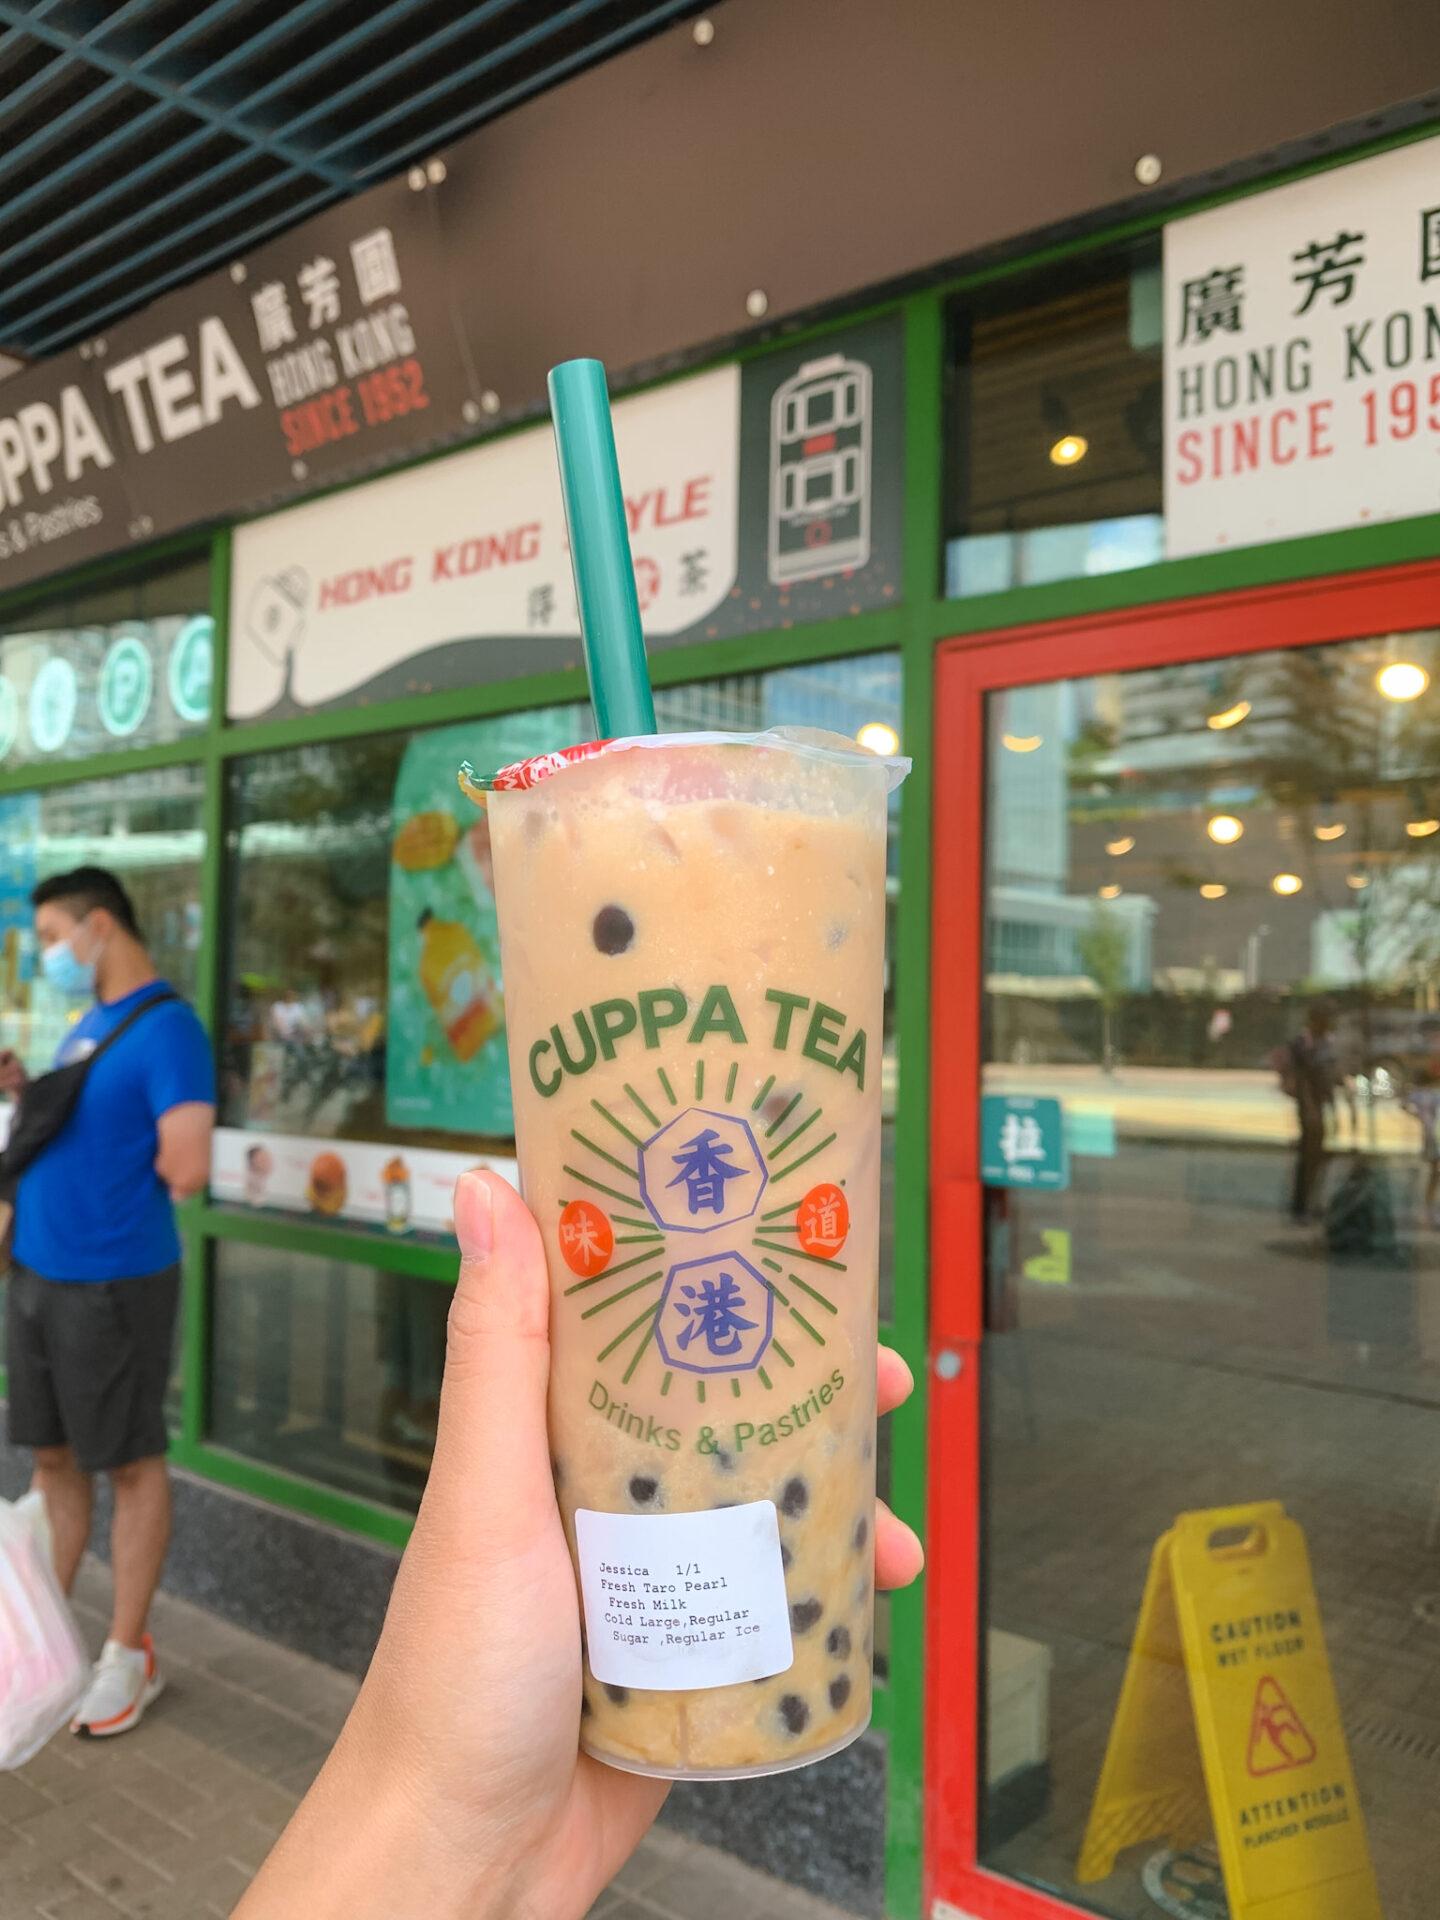 Fresh Taro Pearl Fresh Milk from Cuppa Tea, a Hong Kong-style café and bubble tea spot in Toronto